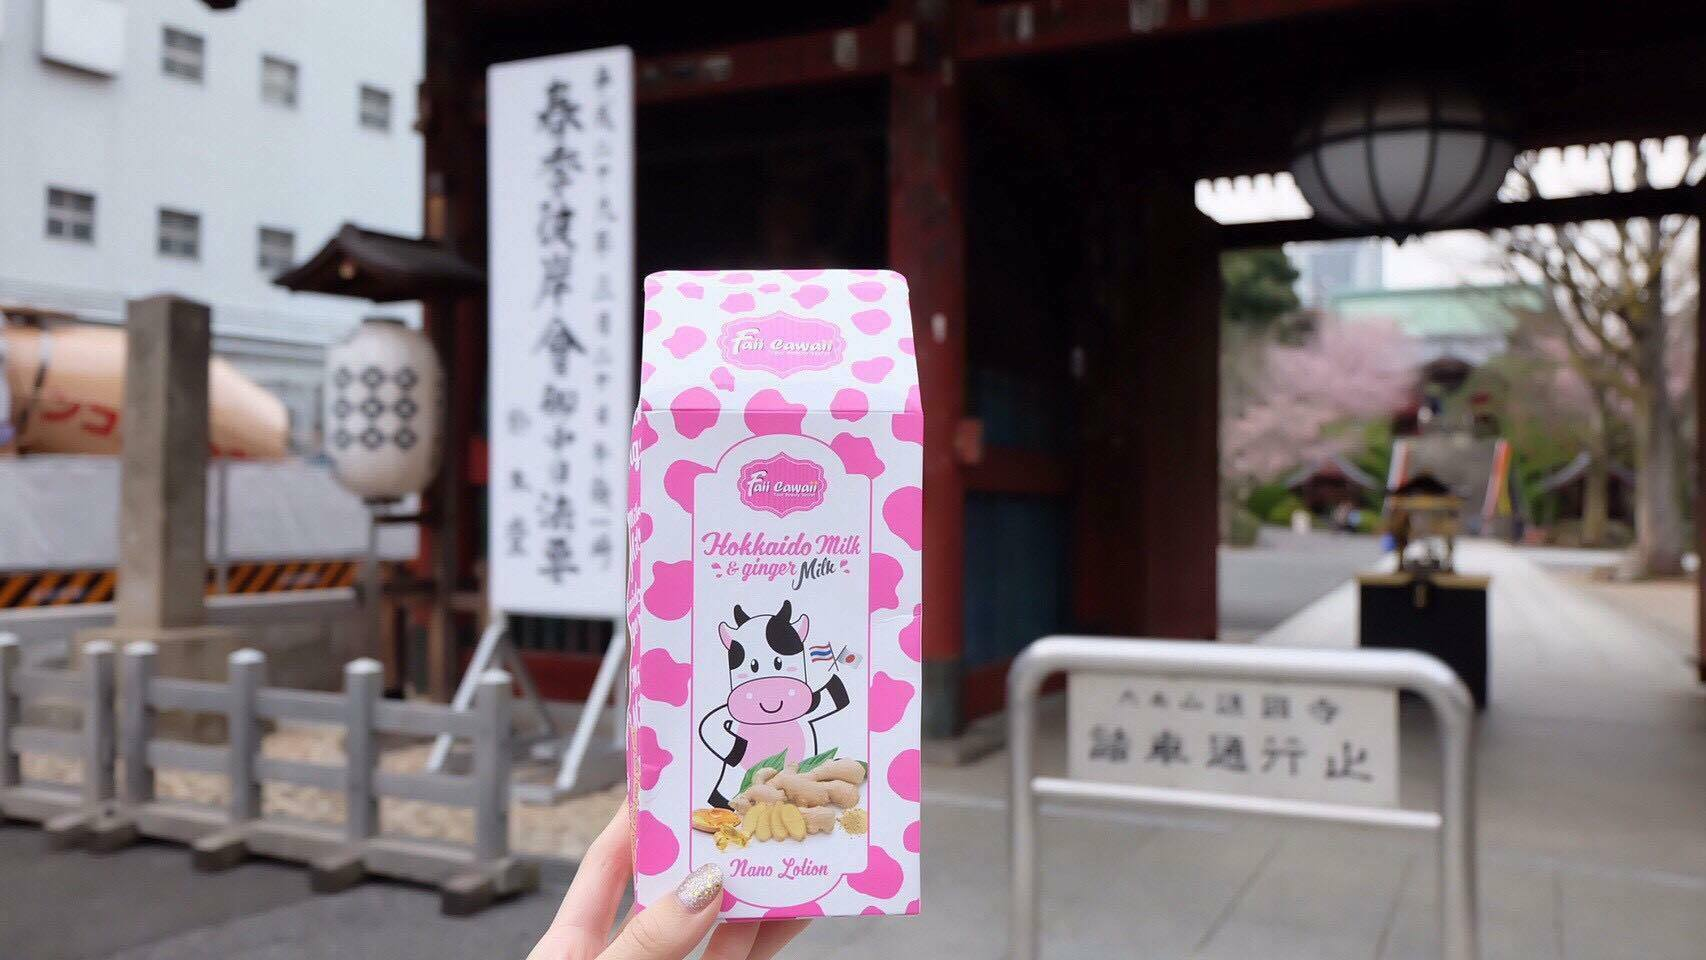 Hokkaido Milk & Ginger Milk Nano Lotion by Faii Cawaii 300 ml. โลชั่นน้ำนมขิง ฮอกไกโด